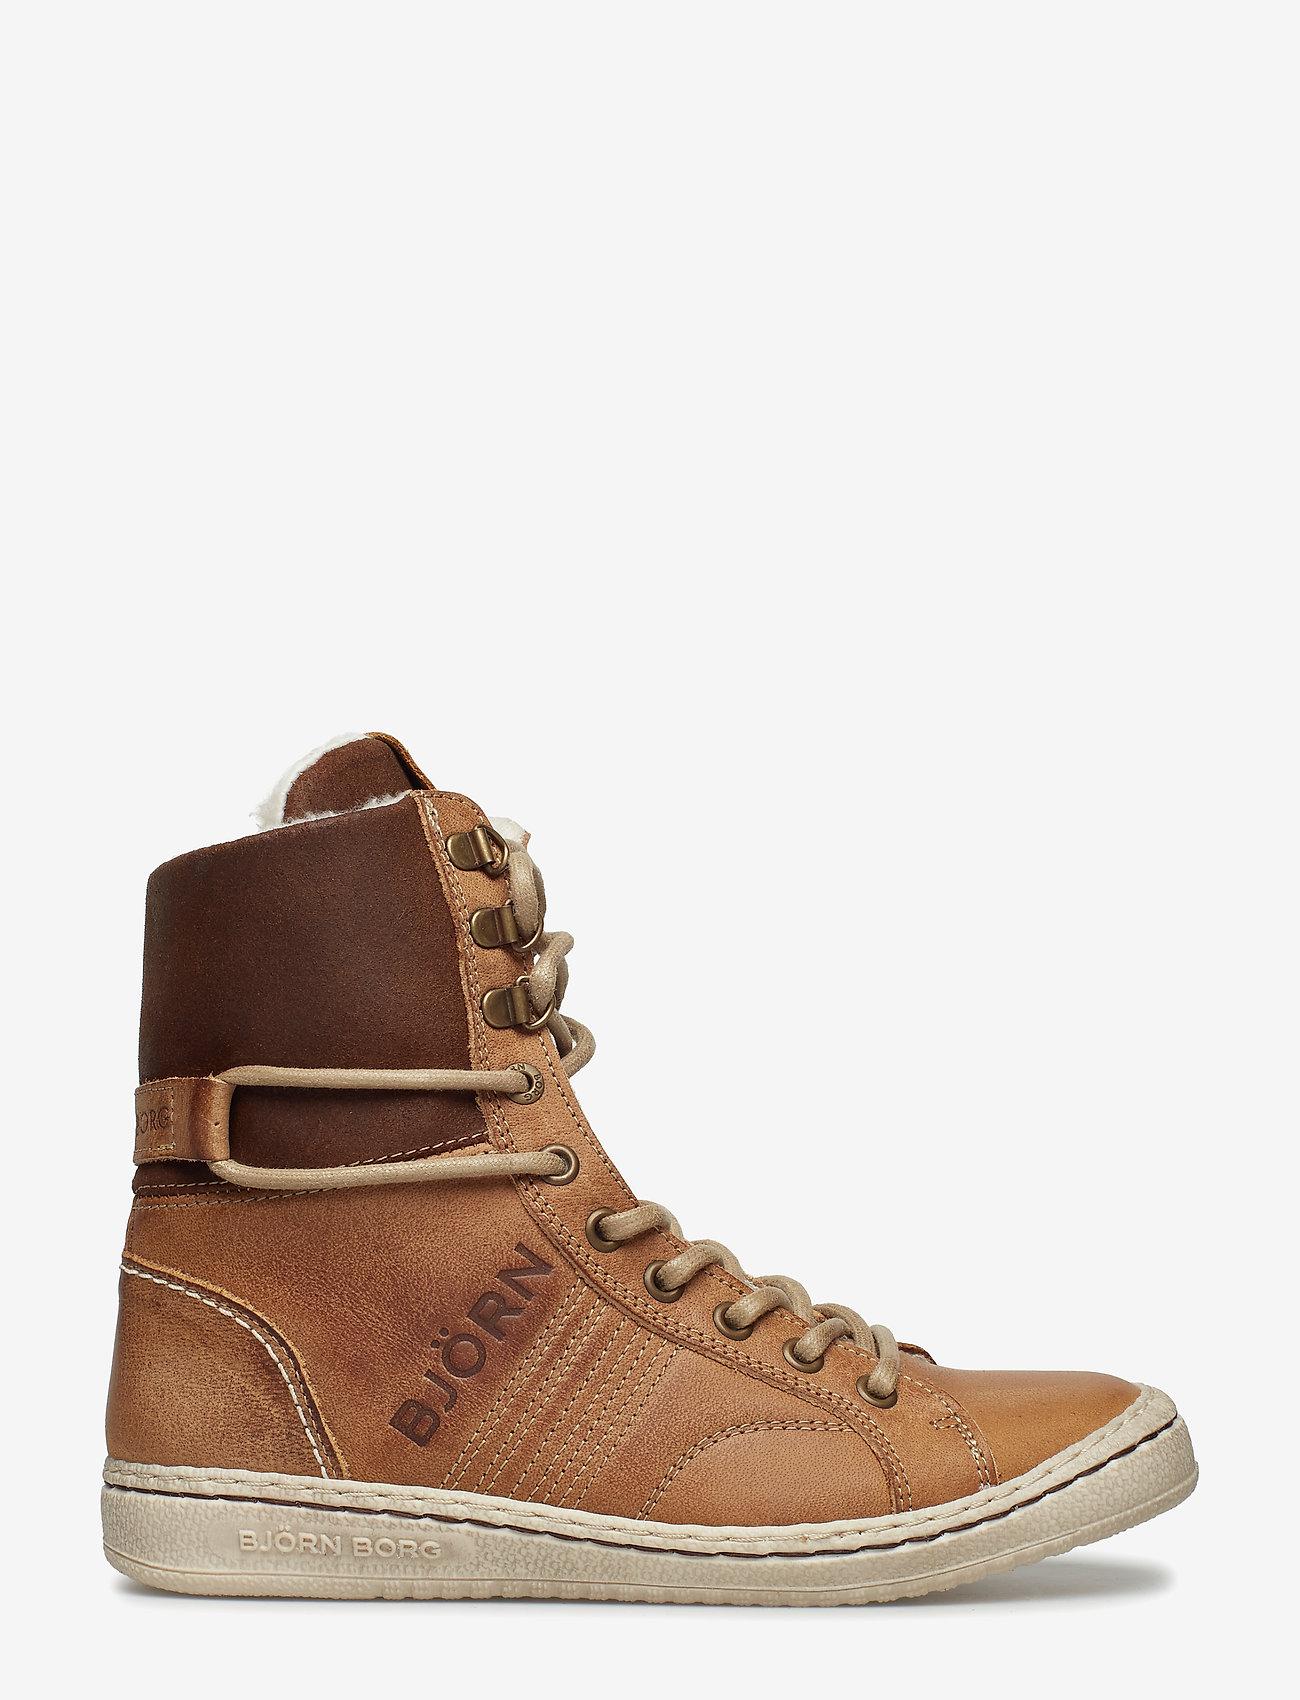 Björn Borg - WENDY HIGH FUR W - flat ankle boots - tan - 1